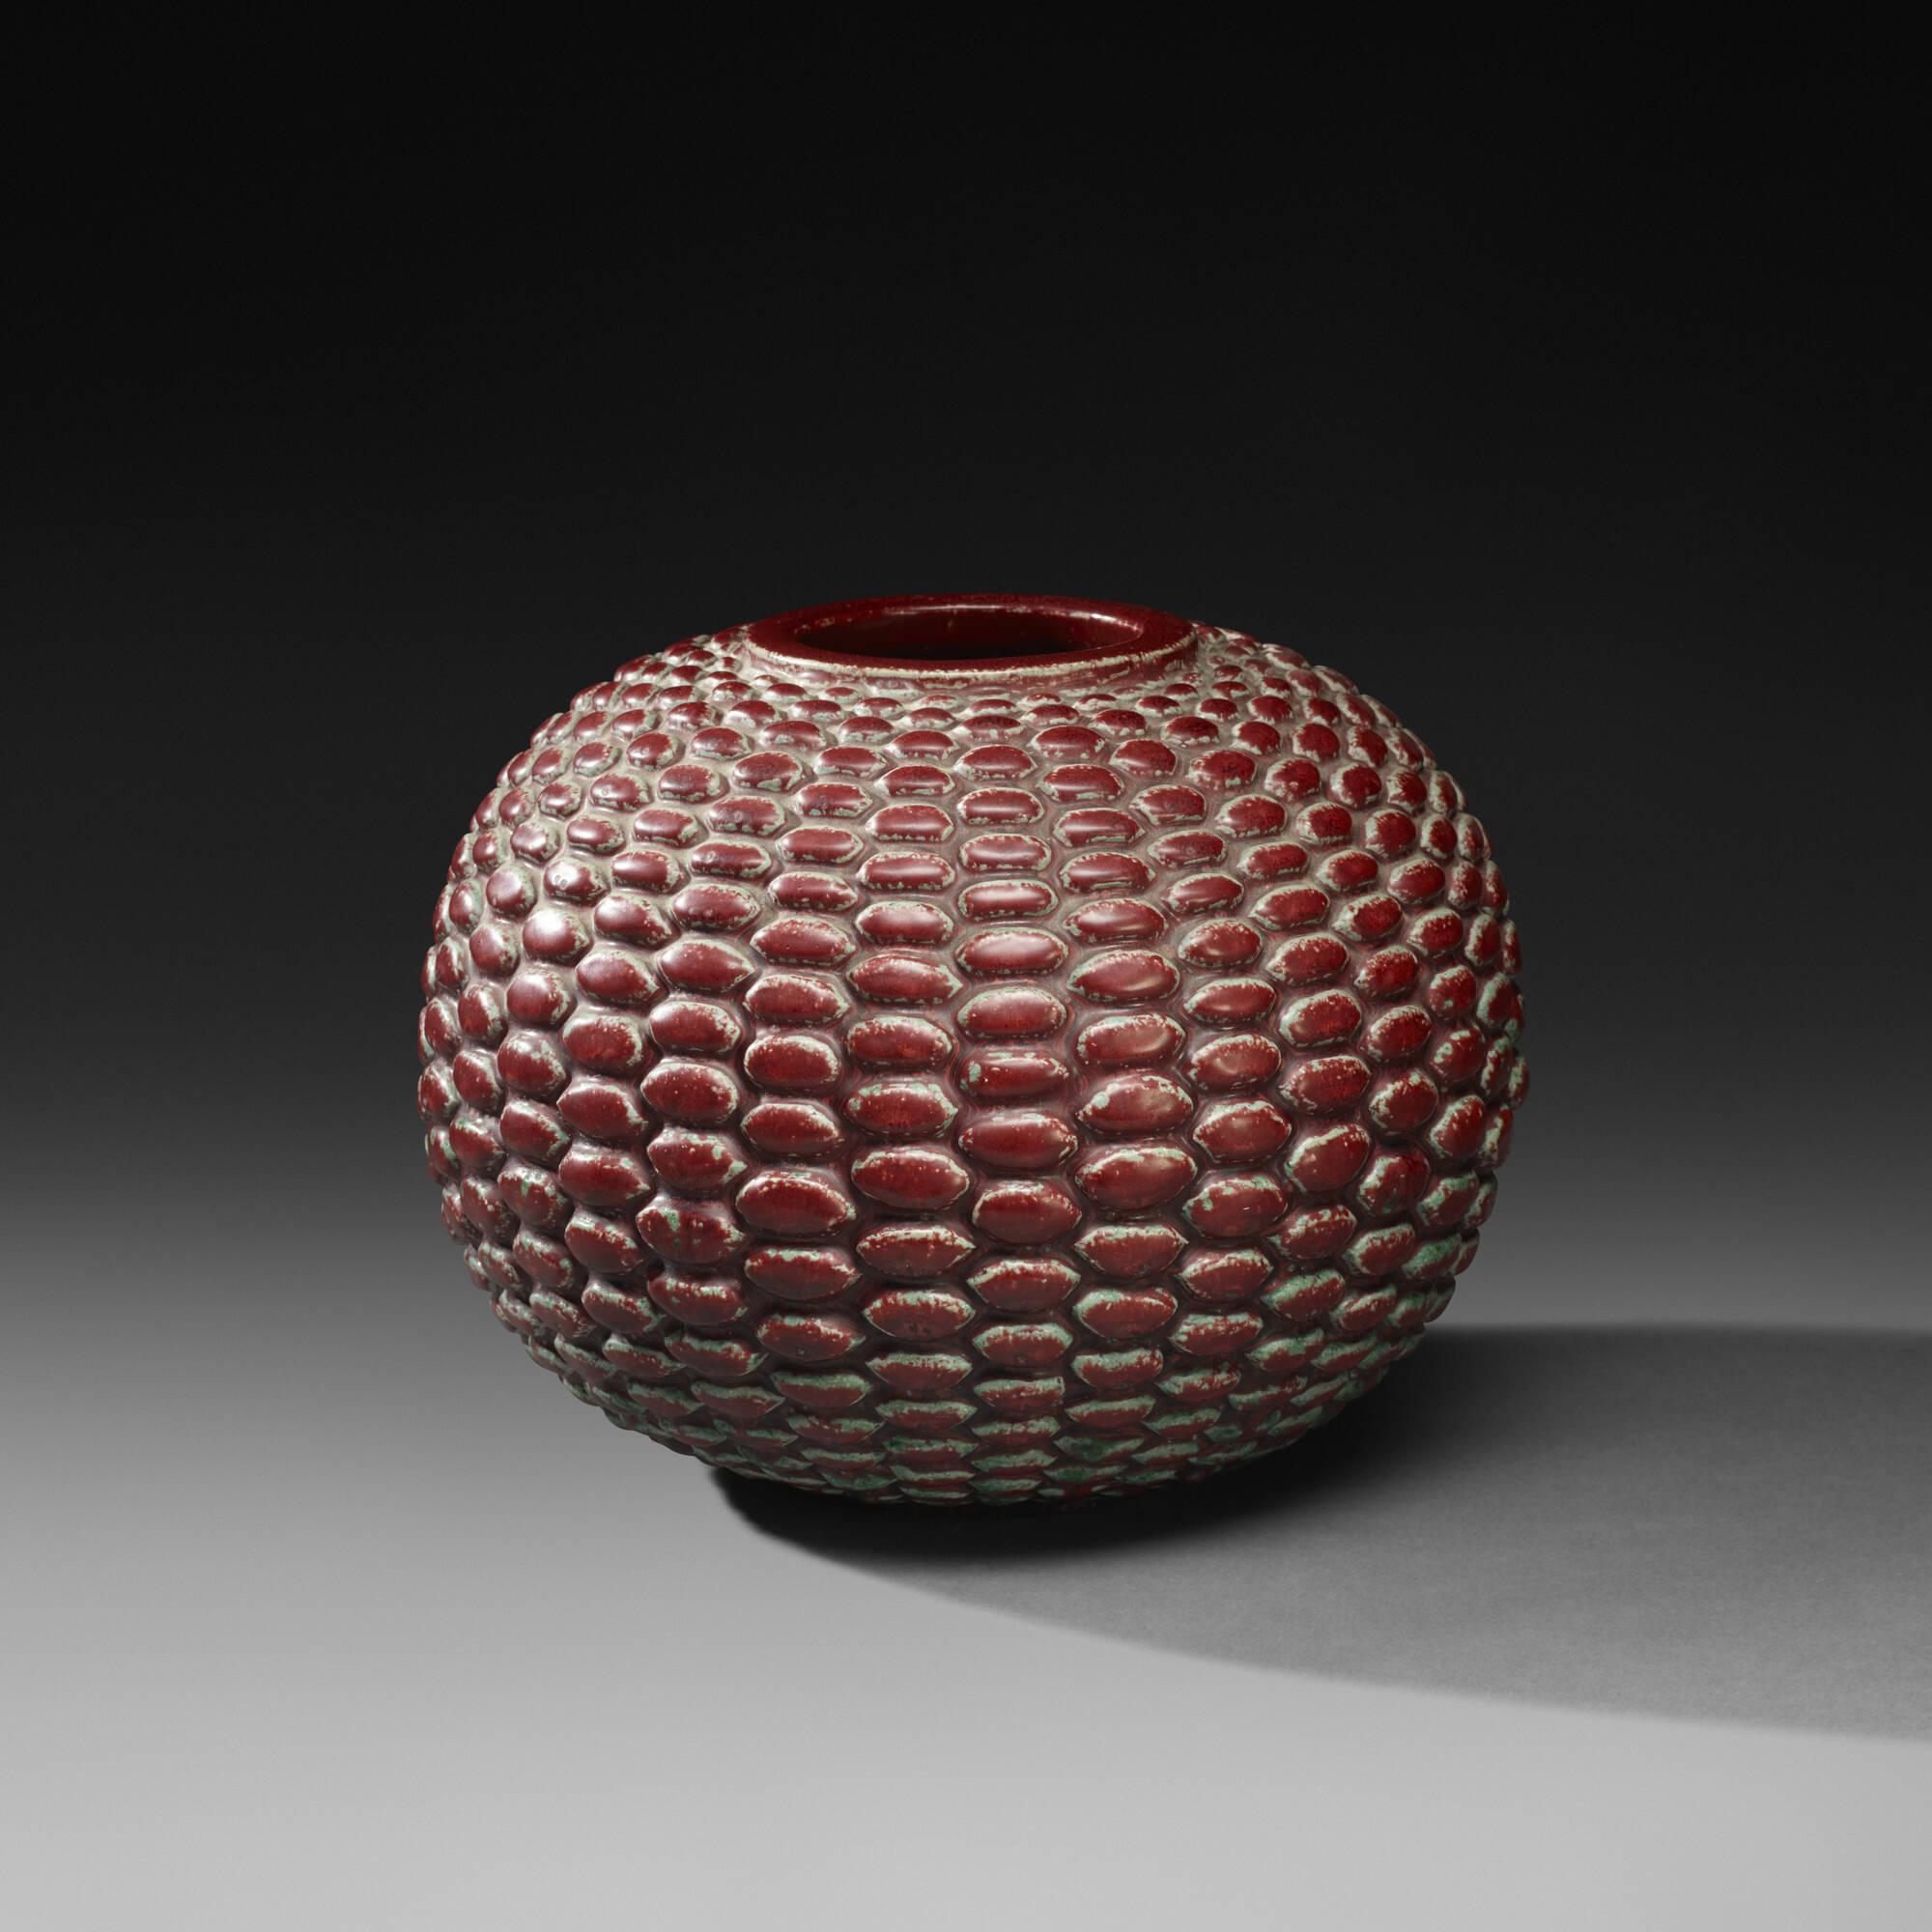 141: Axel Salto / Budding vase (1 of 2)